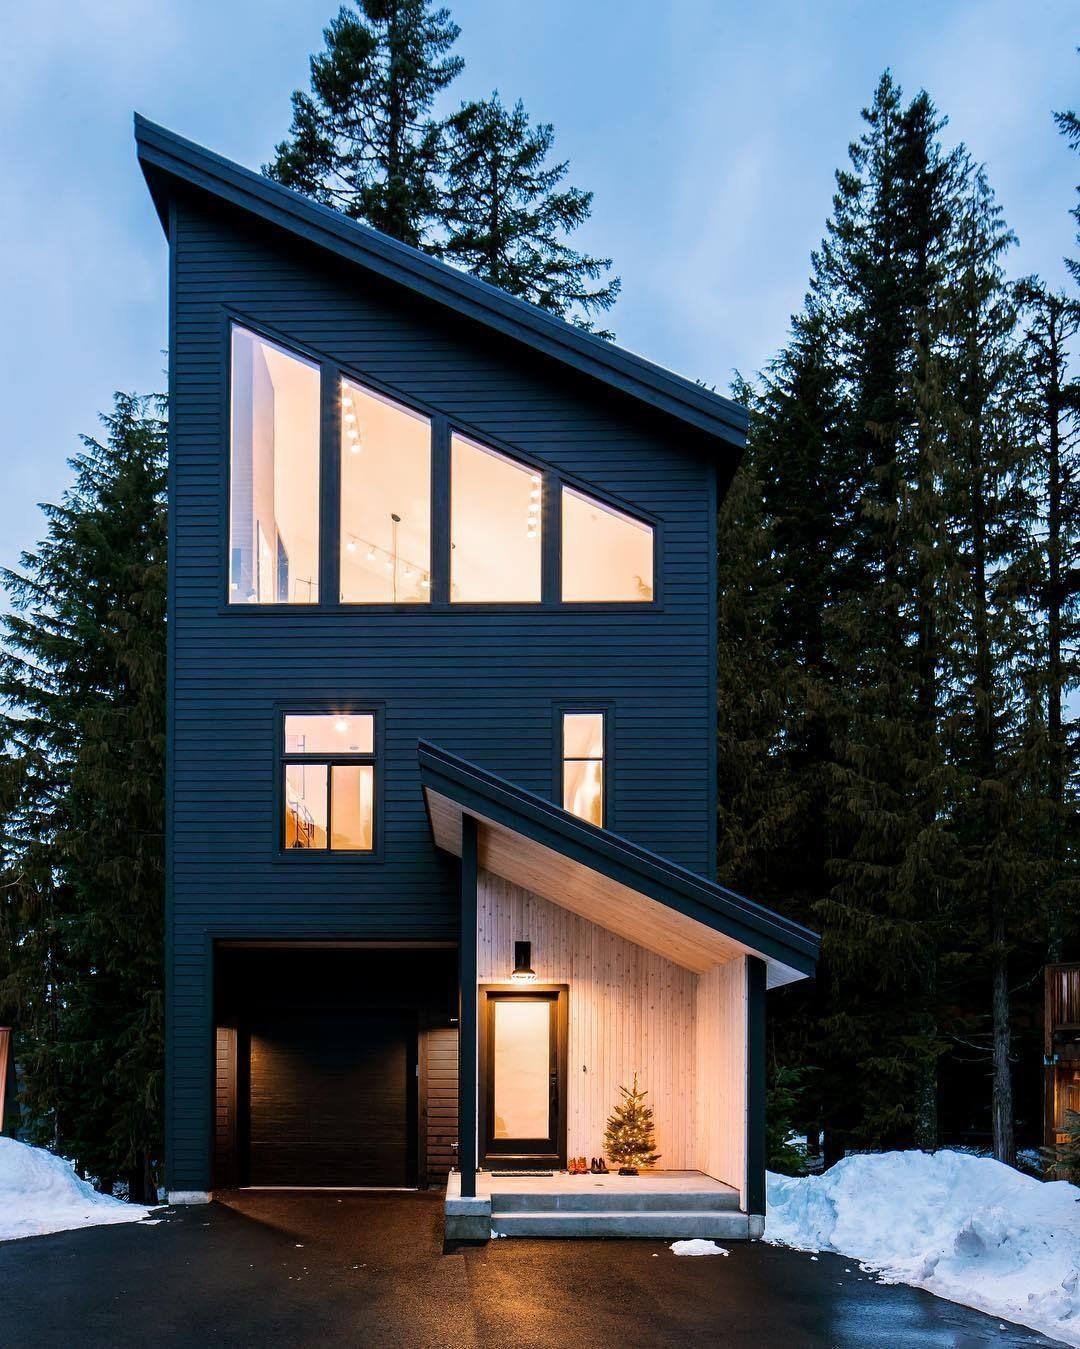 Living A Modern Ski Chalet Chalet Design Ski Cabin Architecture